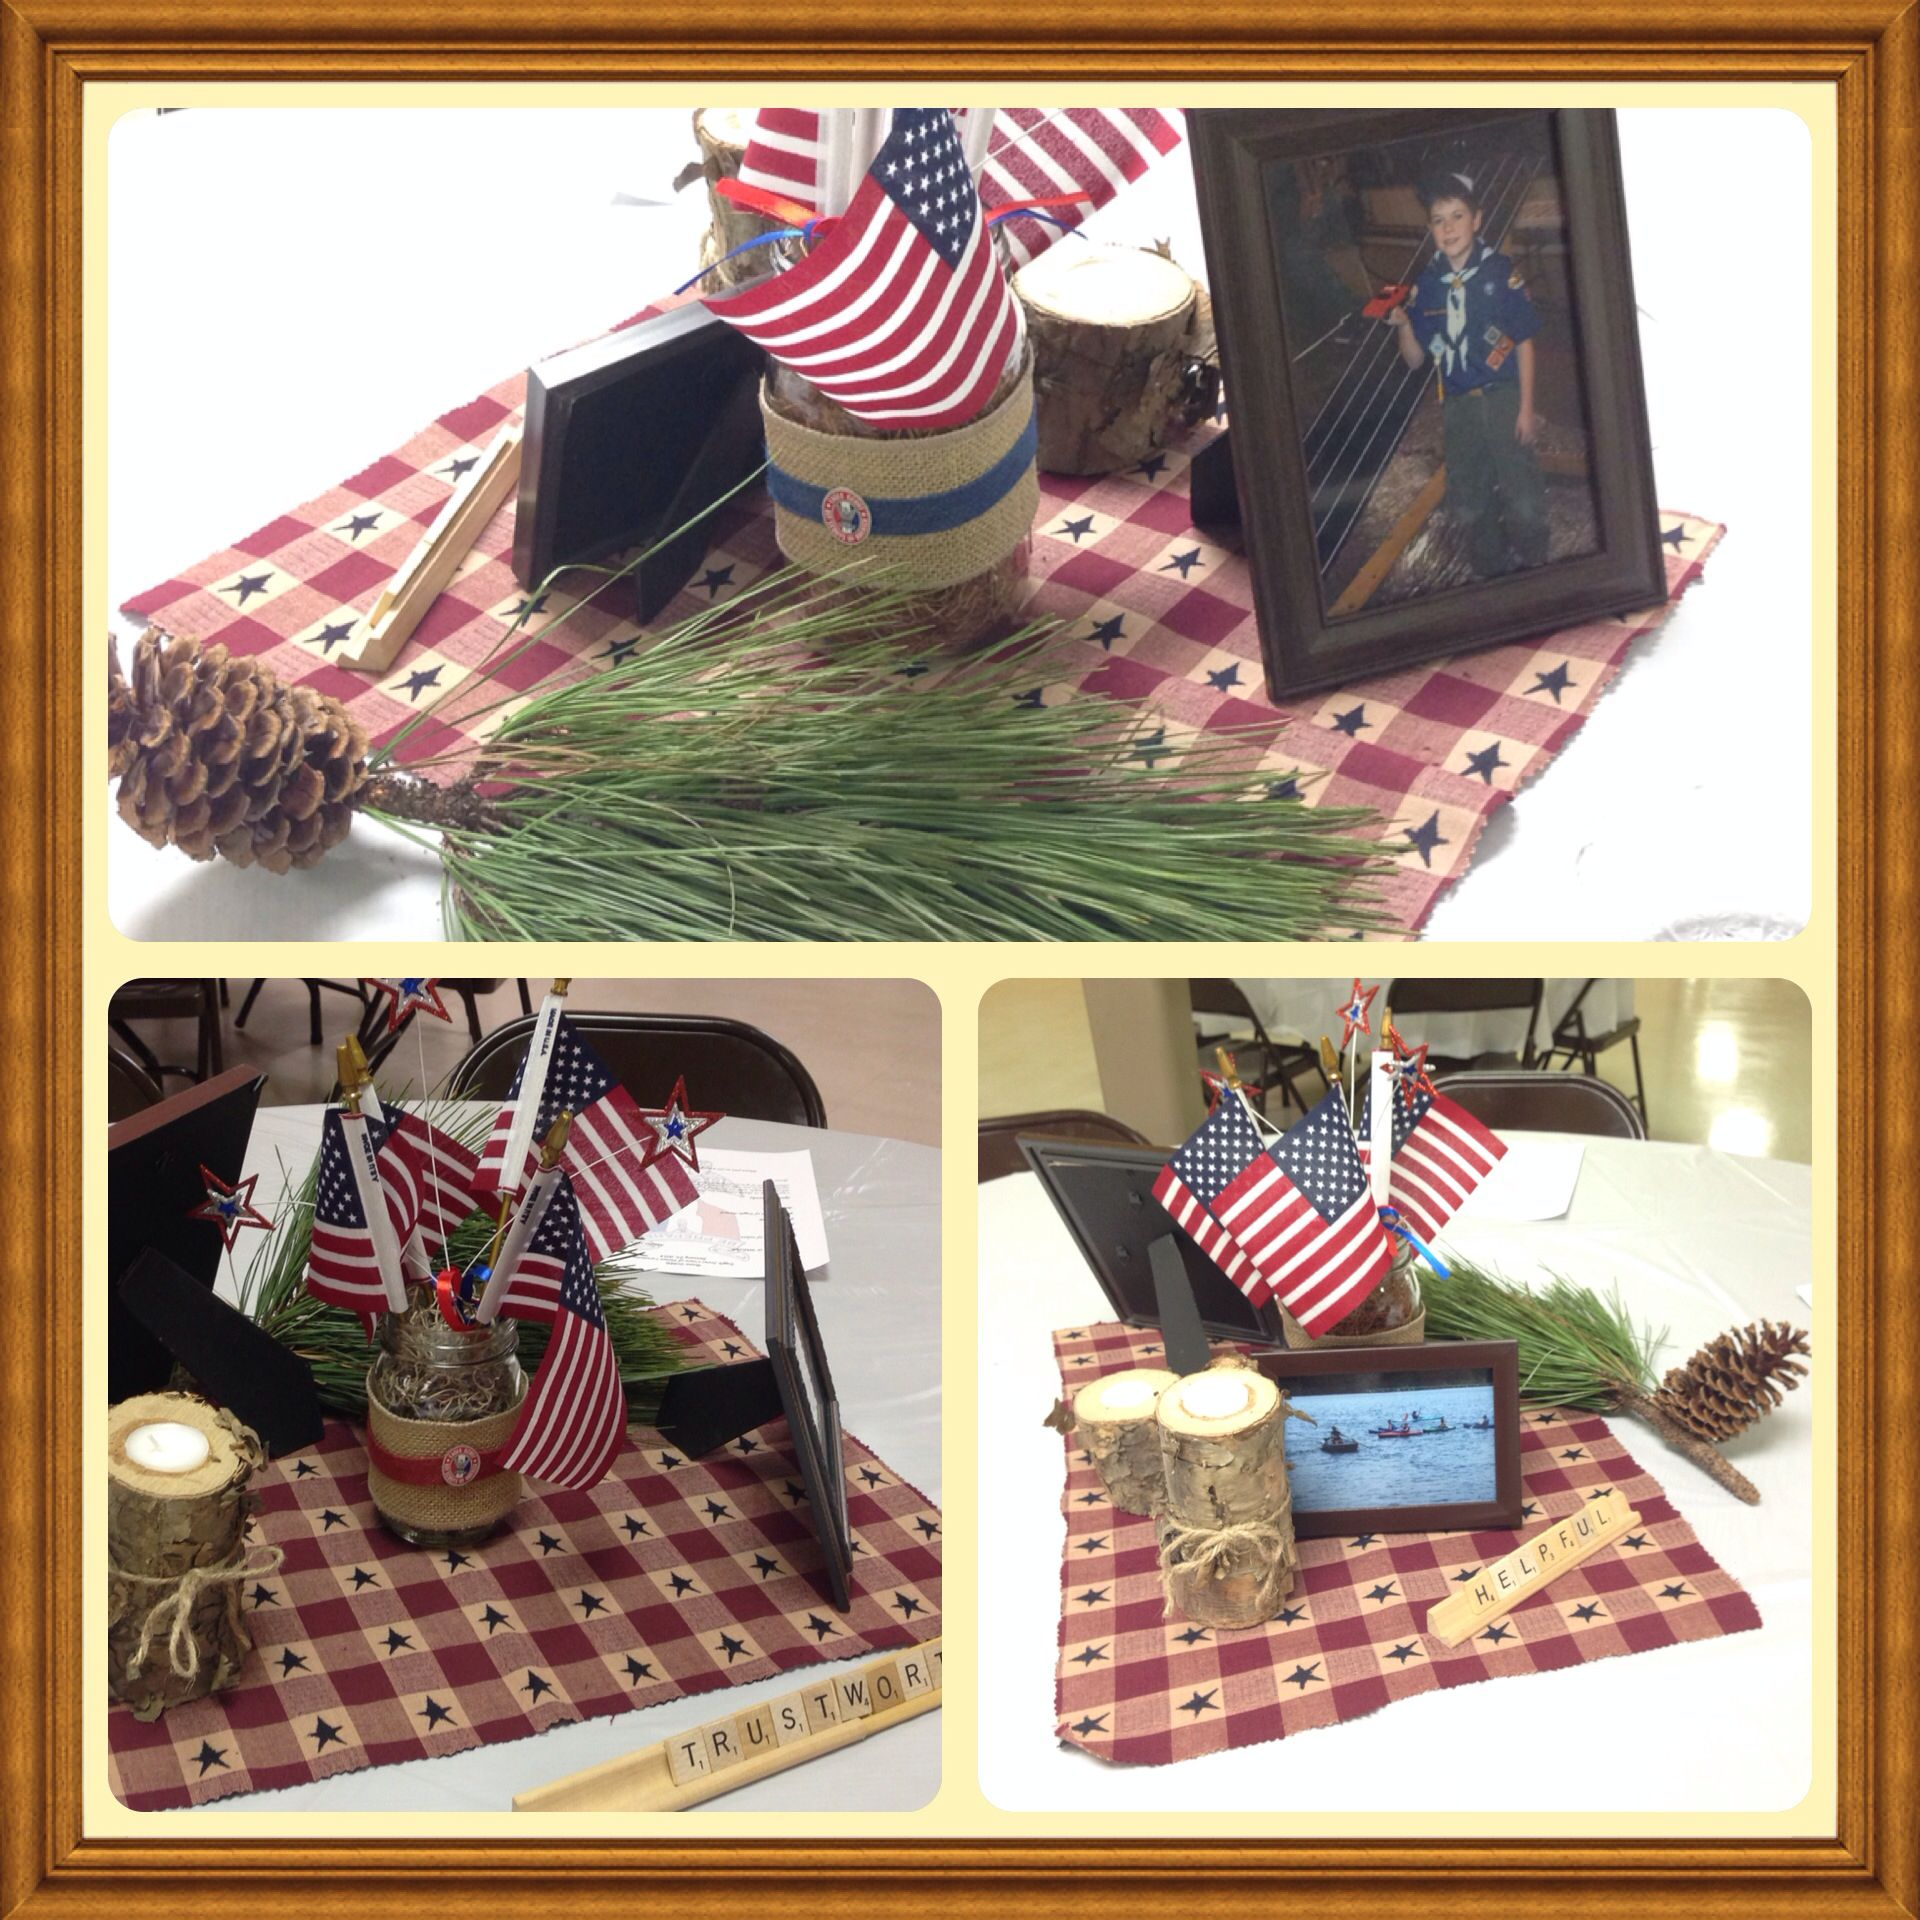 foto de Eagle Scout court of honor table centerpieces with